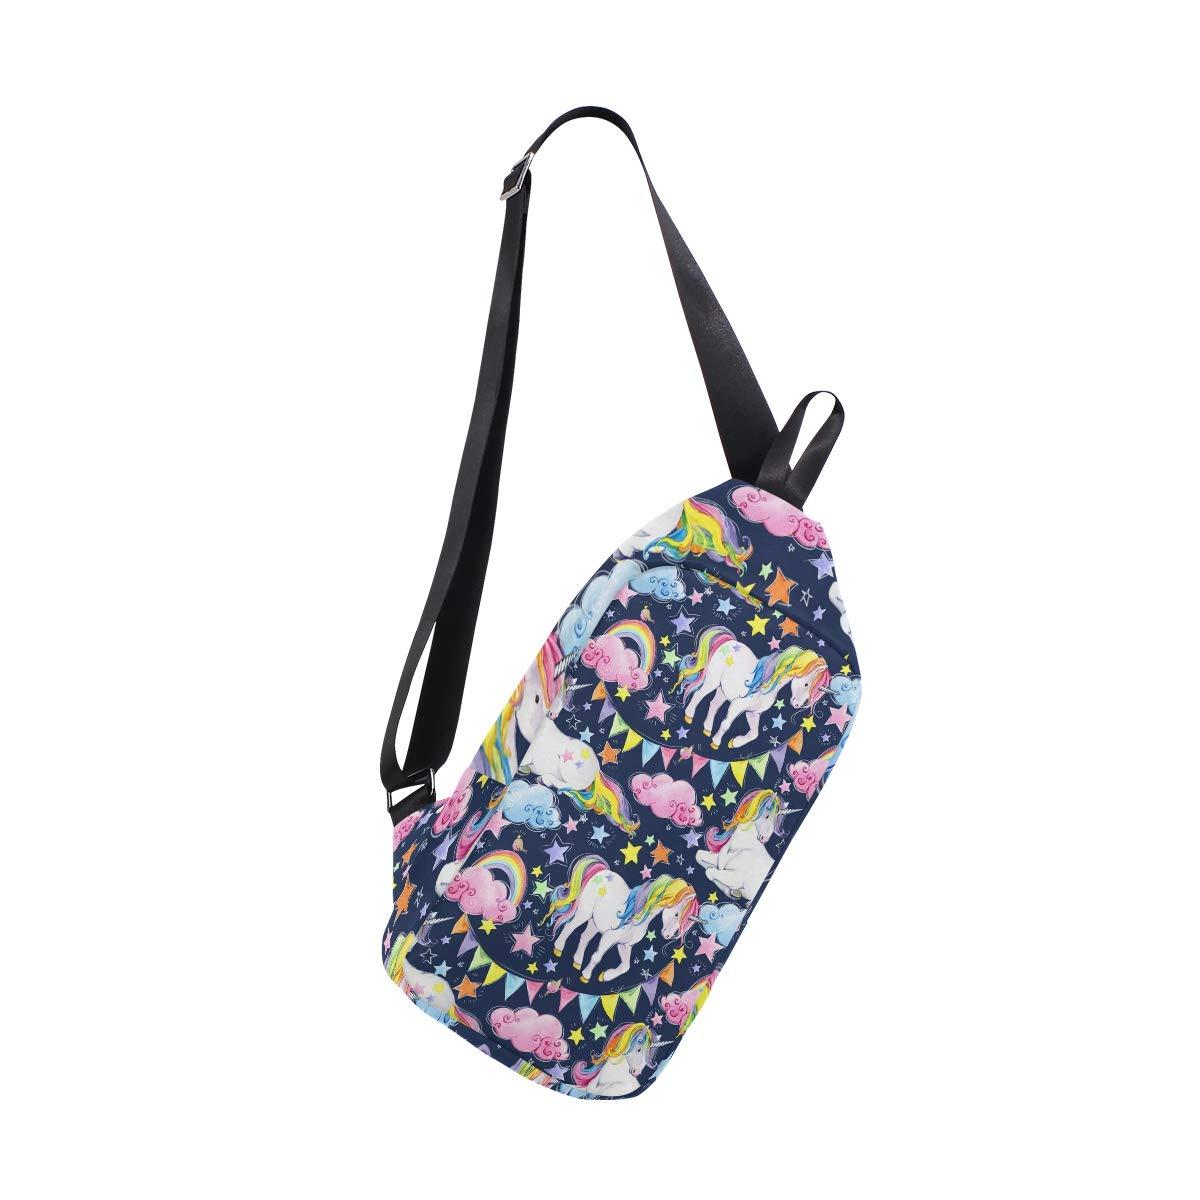 TFONE Cute Rainbow Unicorn Crossbody Bag Lightweight Chest Shoulder Messenger Pack Backpack Sling Bag